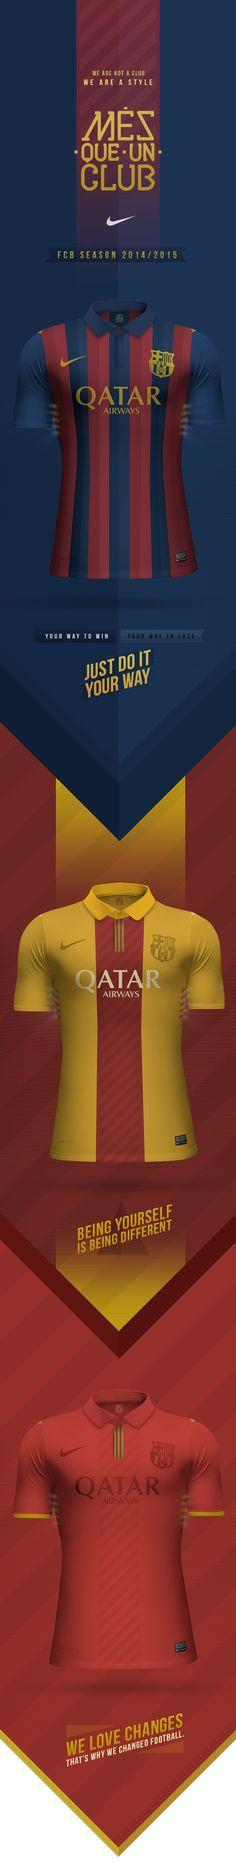 Barcelona FC - Concept on Behance